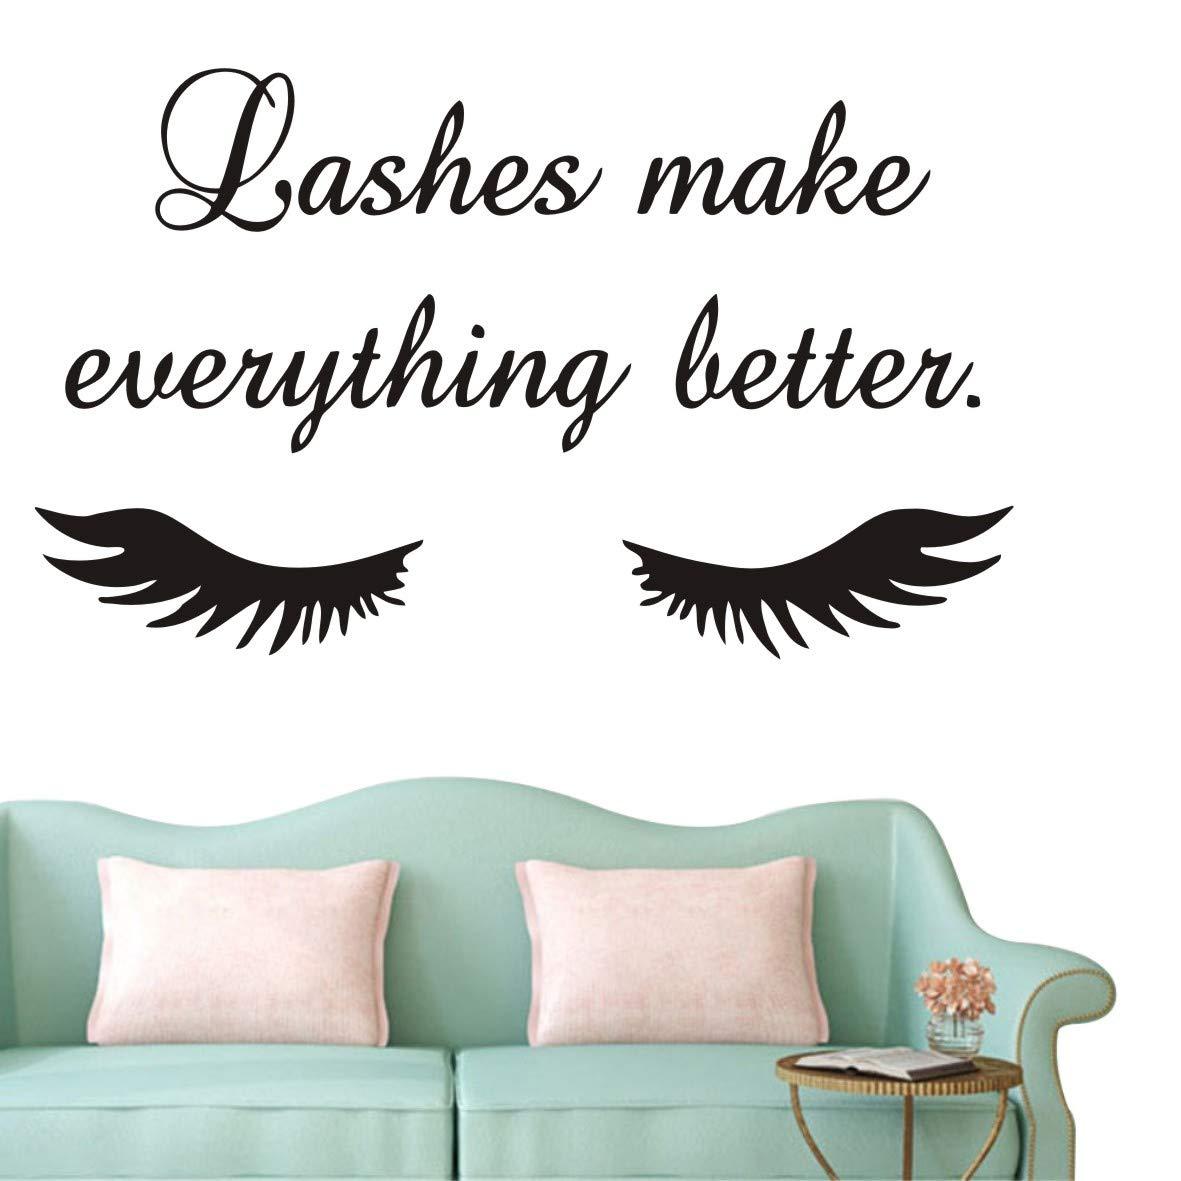 YOYOYU ART HOME DECOR Lashes Make Everything Better Quote Wall Decal Beauty Salon Eyelash Wall Decal Closed Eyelashes Quote Wall Window Decorative AY1078 (Black)